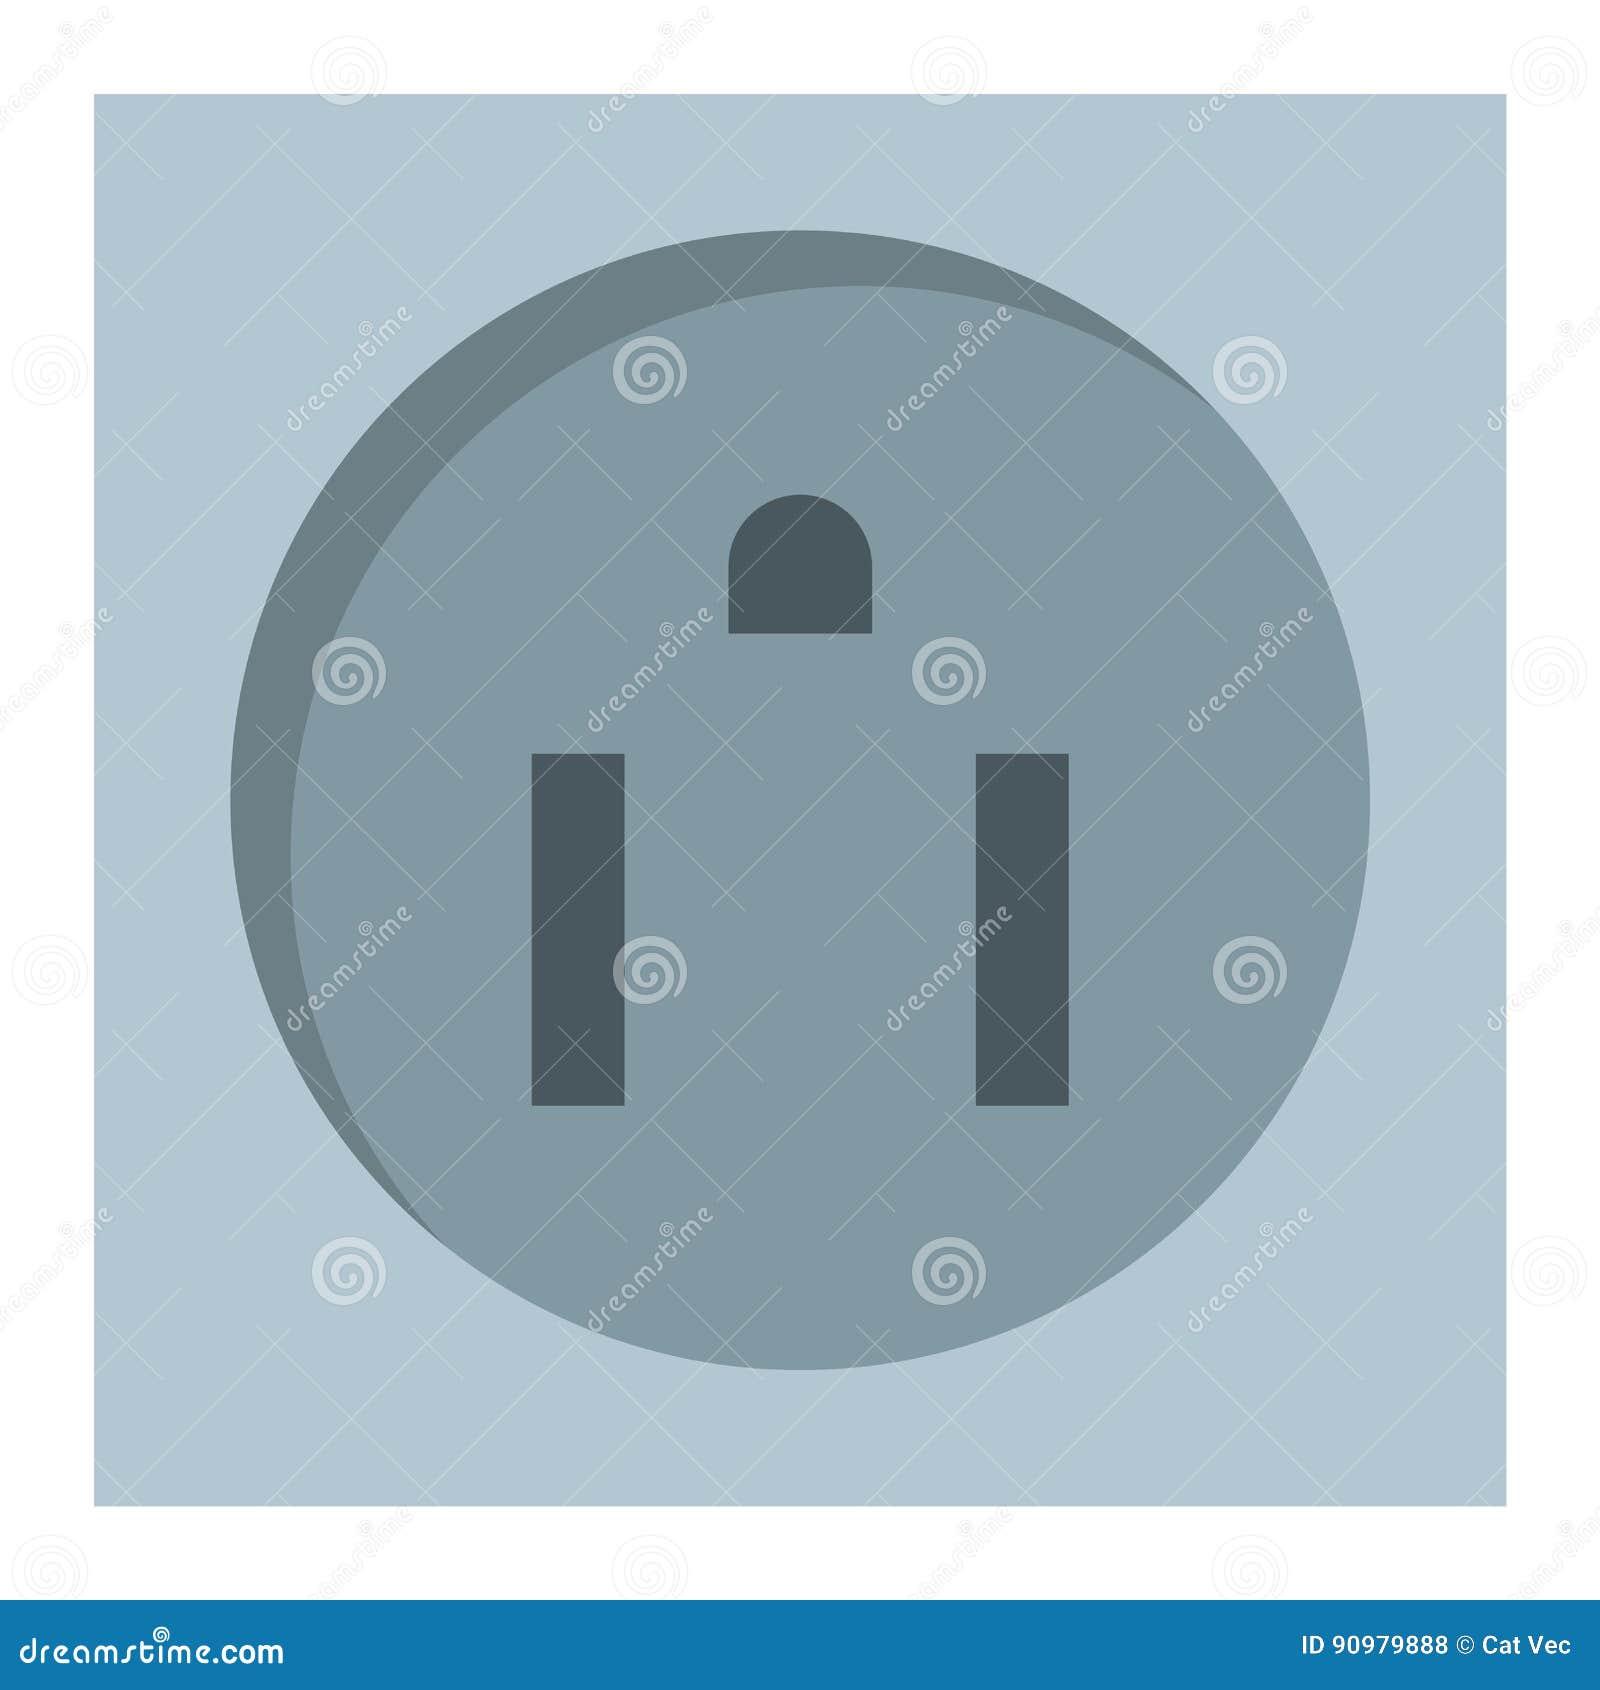 Outlet Diagram Icon - DIY Enthusiasts Wiring Diagrams •